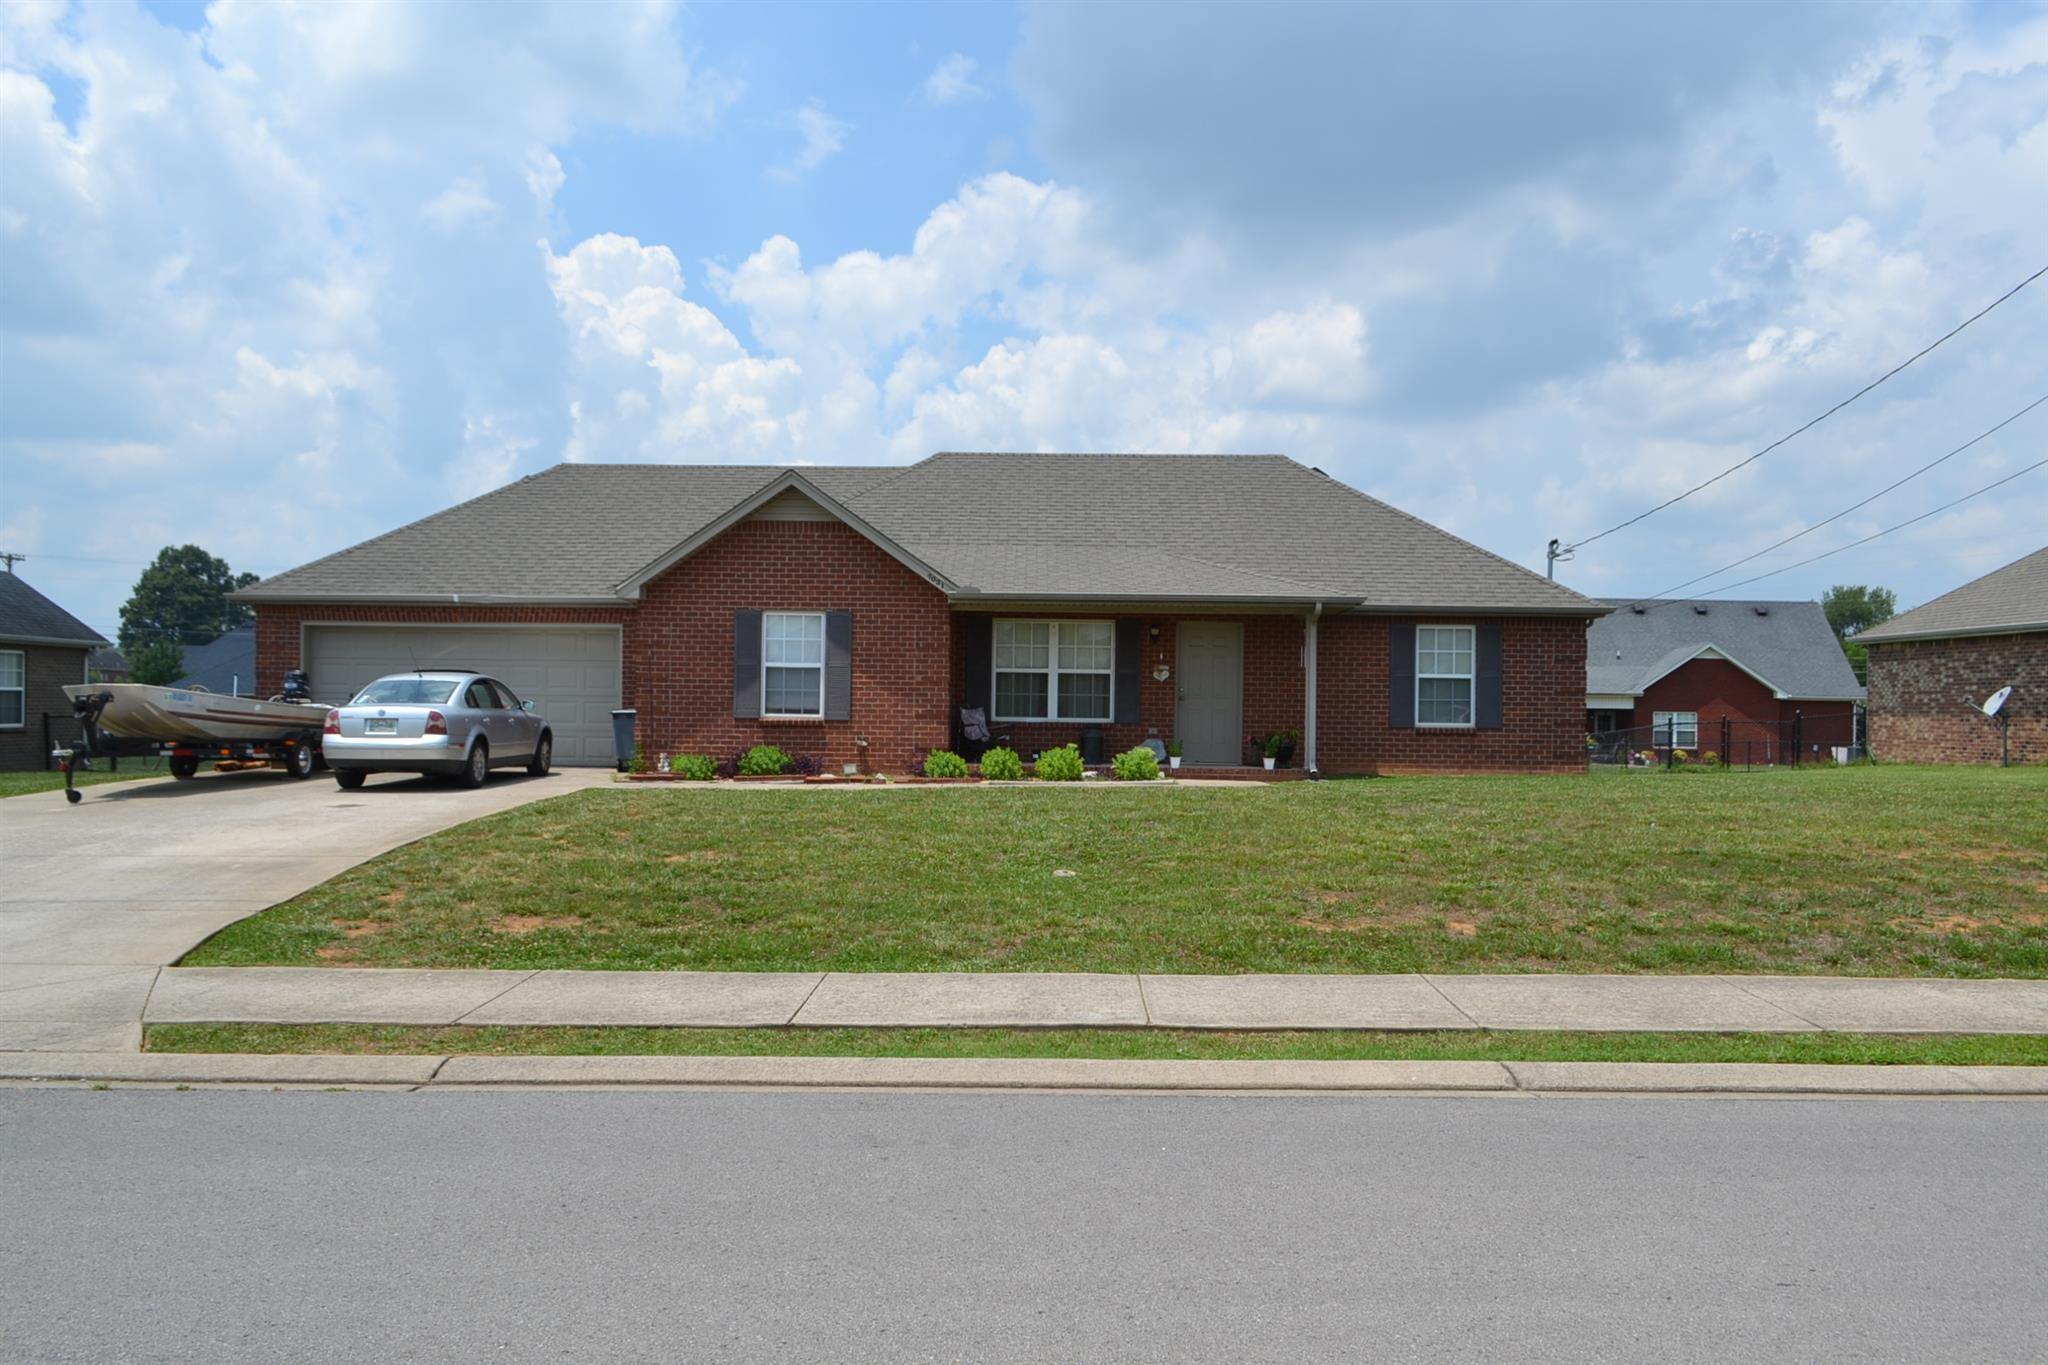 7031 Bridgewater Dr, Smyrna, TN 37167